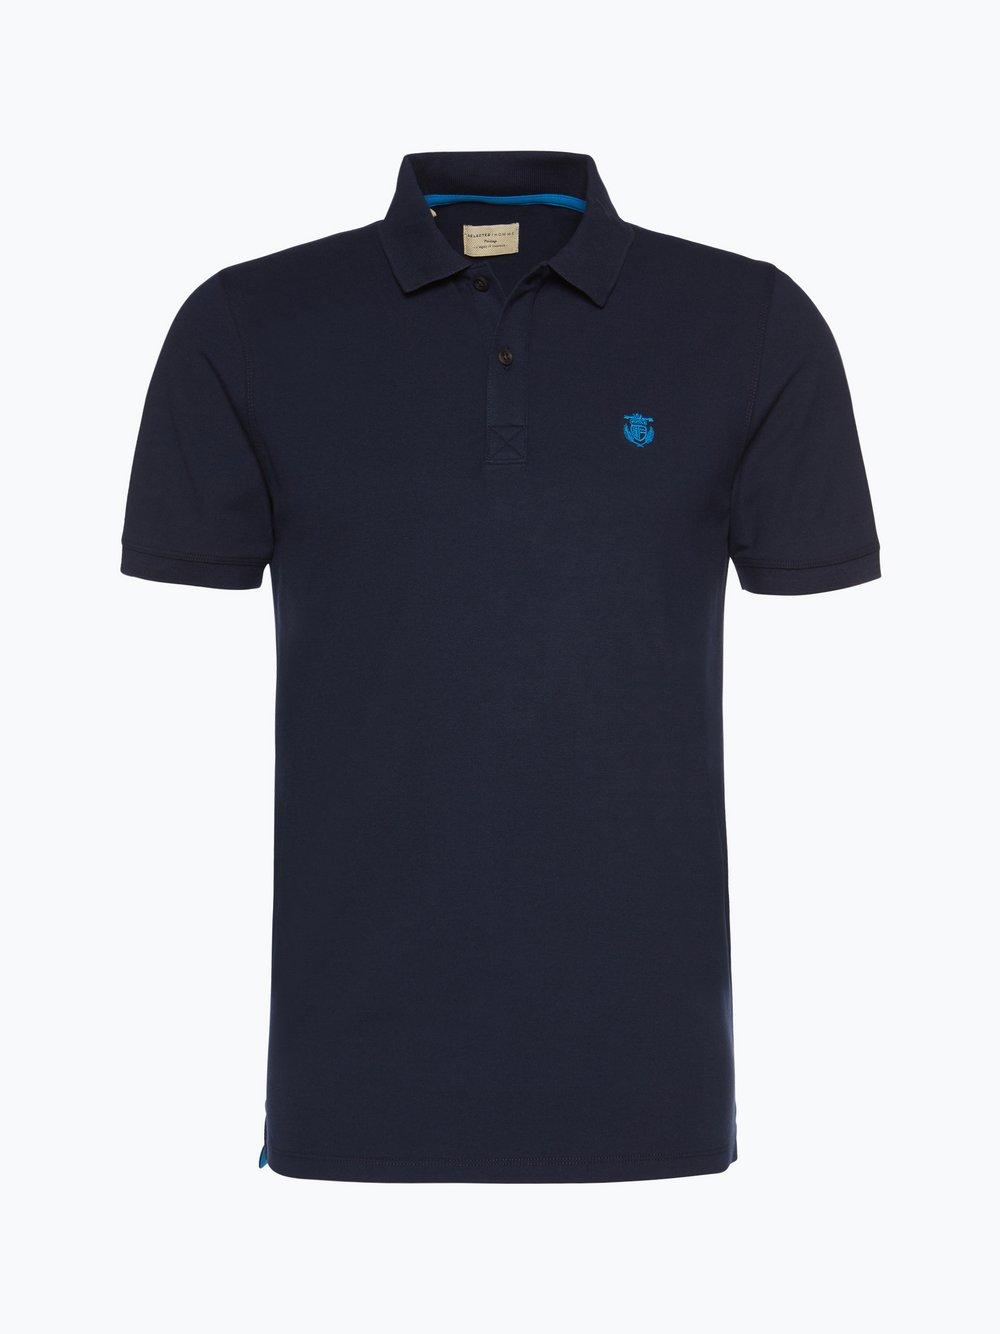 Selected - Męska koszulka polo - Shharo, niebieski